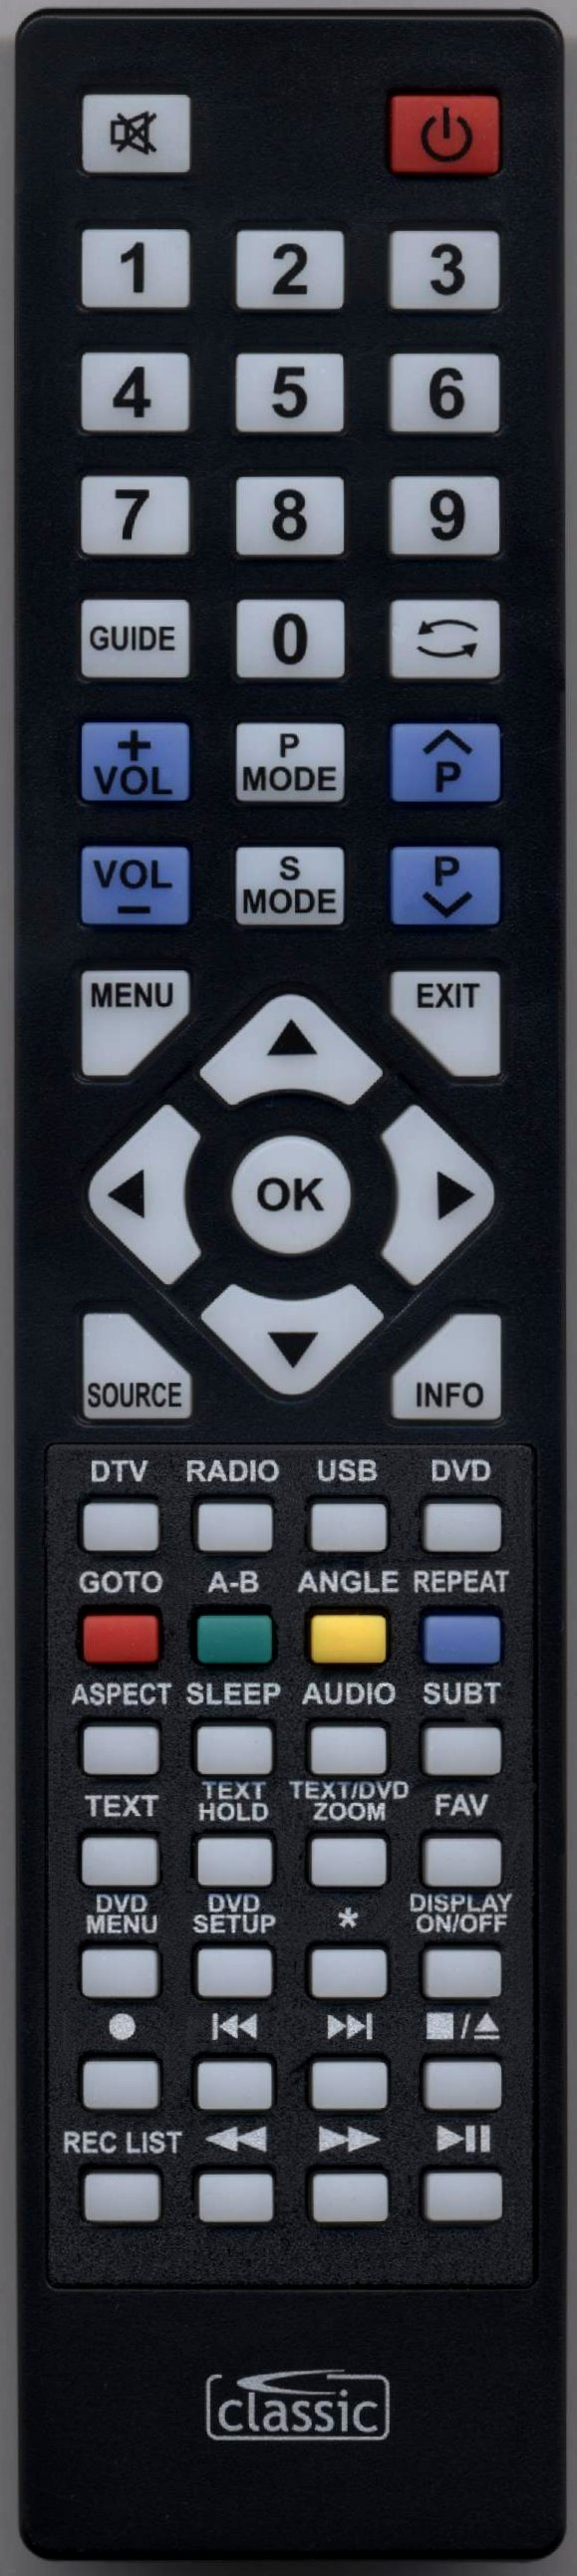 Blaupunkt 32/1480-GB-11B-EGDU-UK Remote Control